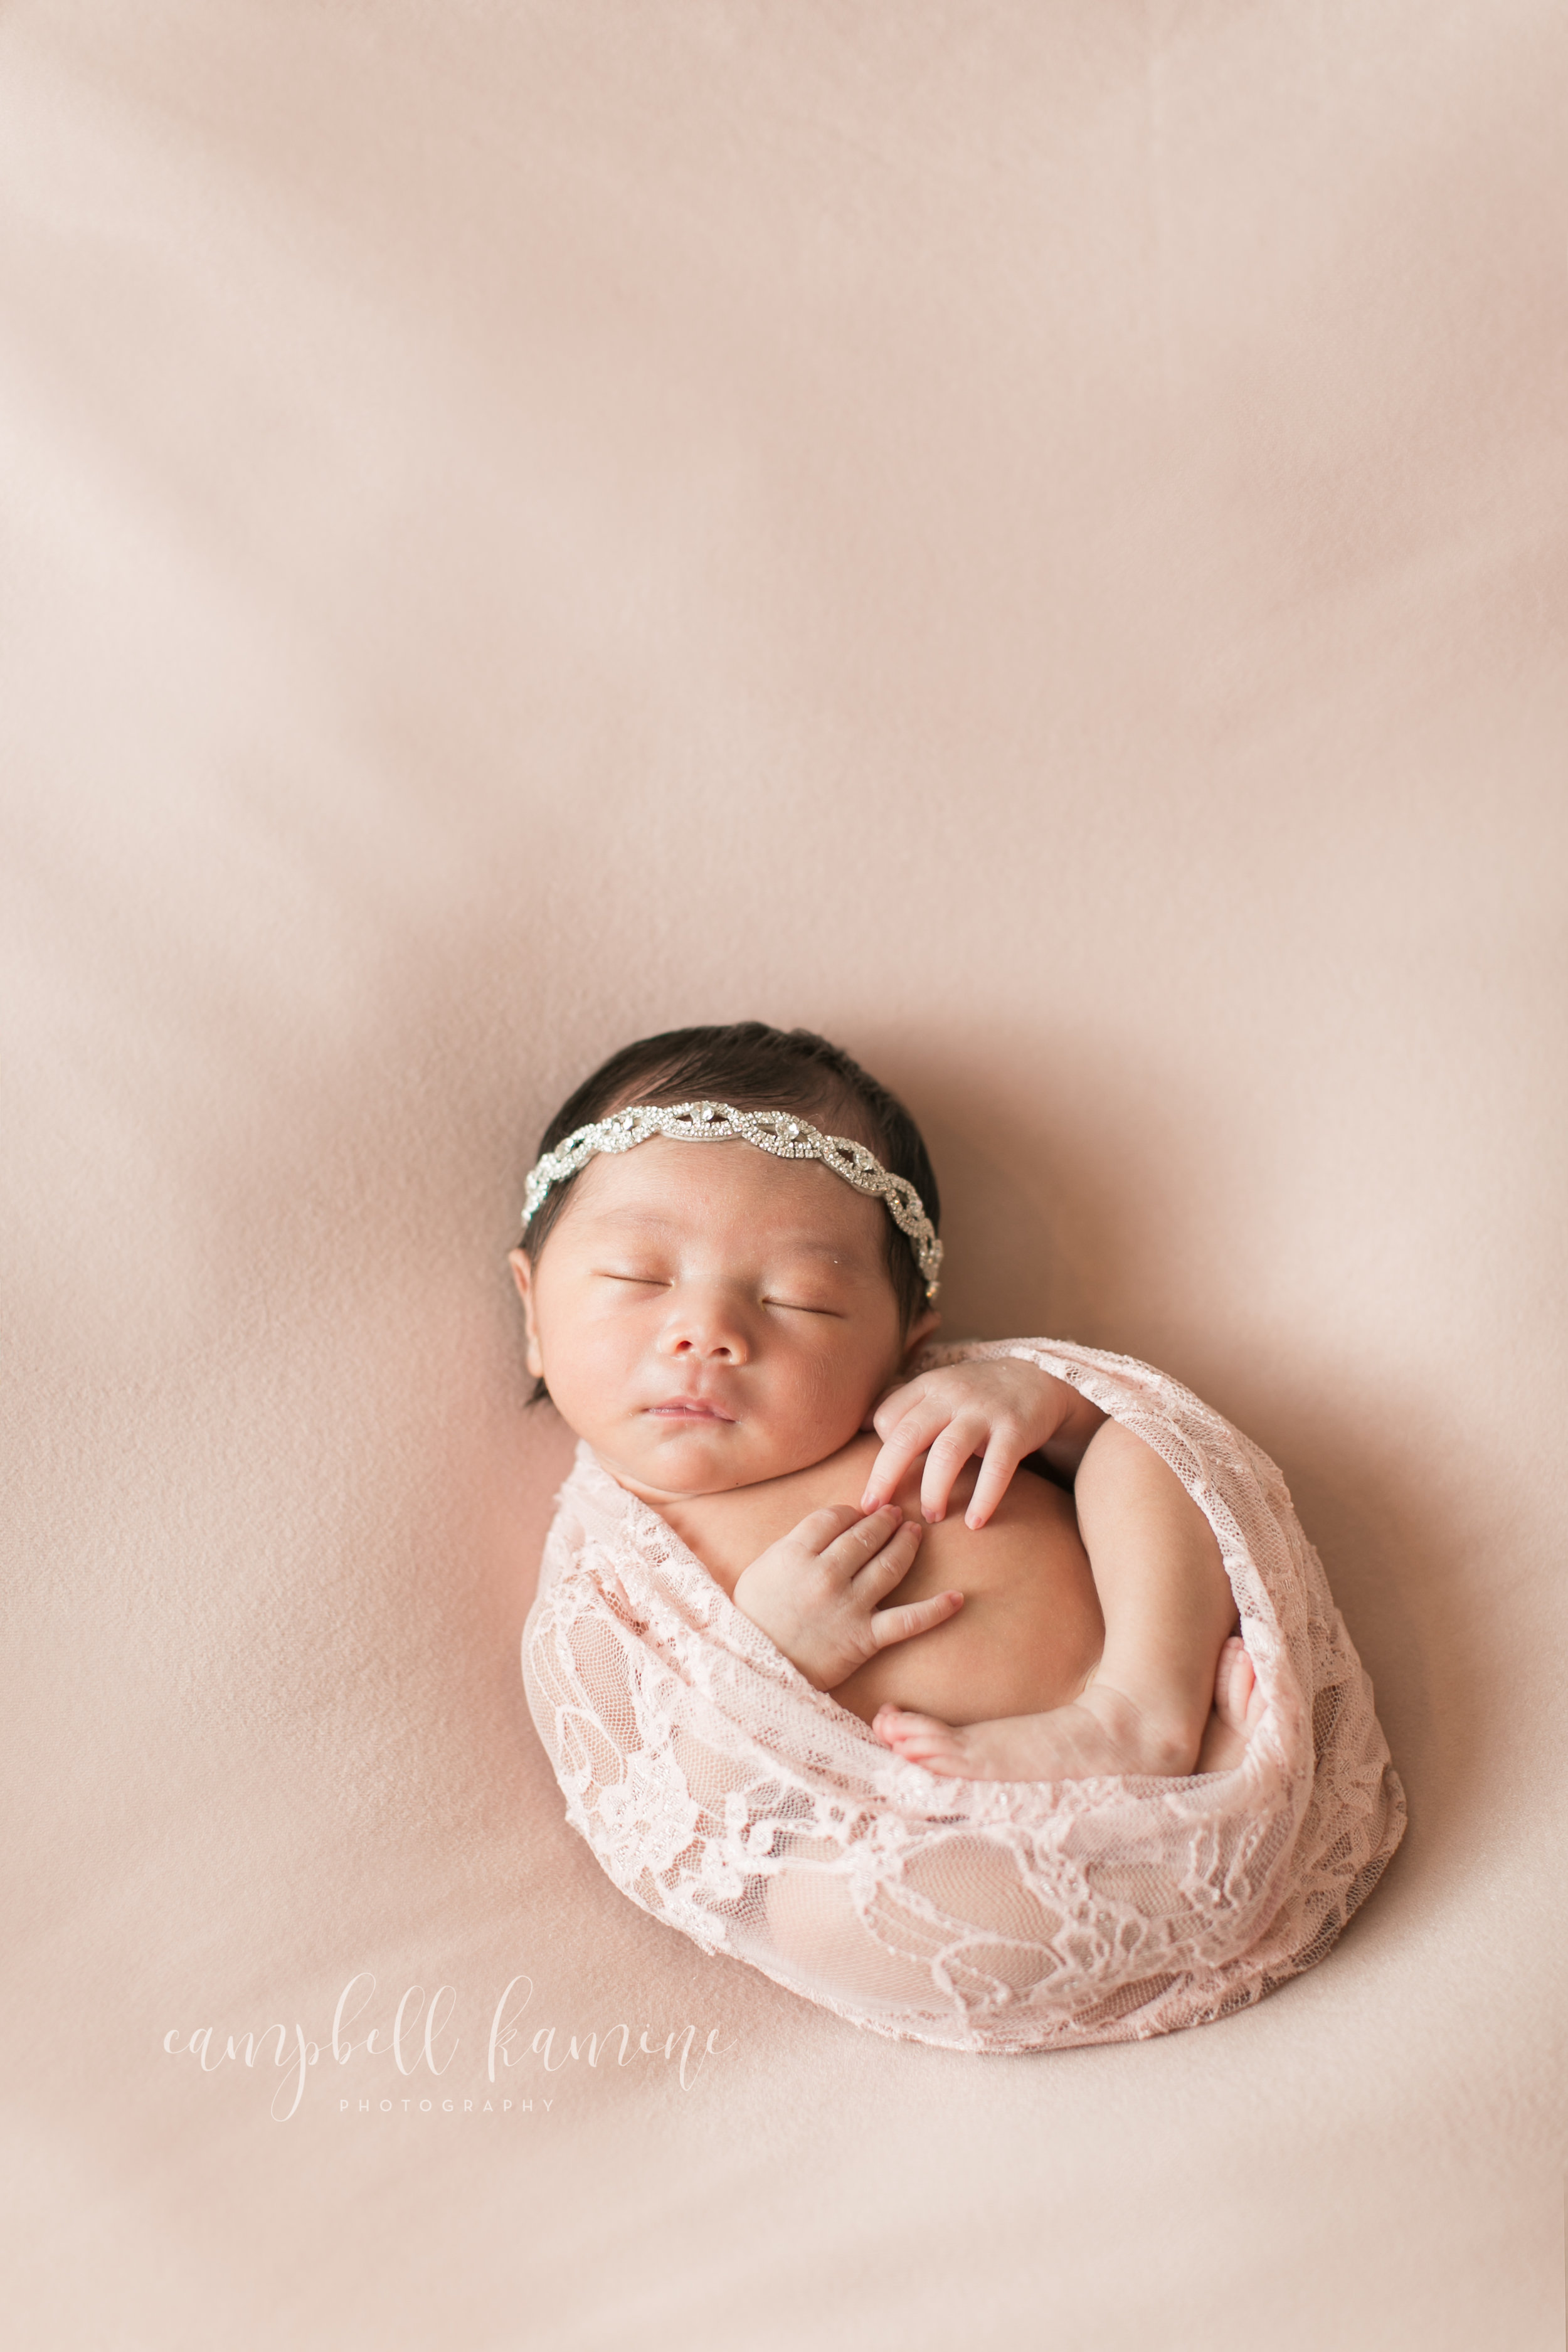 b657ad72cf32c California Newborn Photographer   Campbell Kamine Photography ...